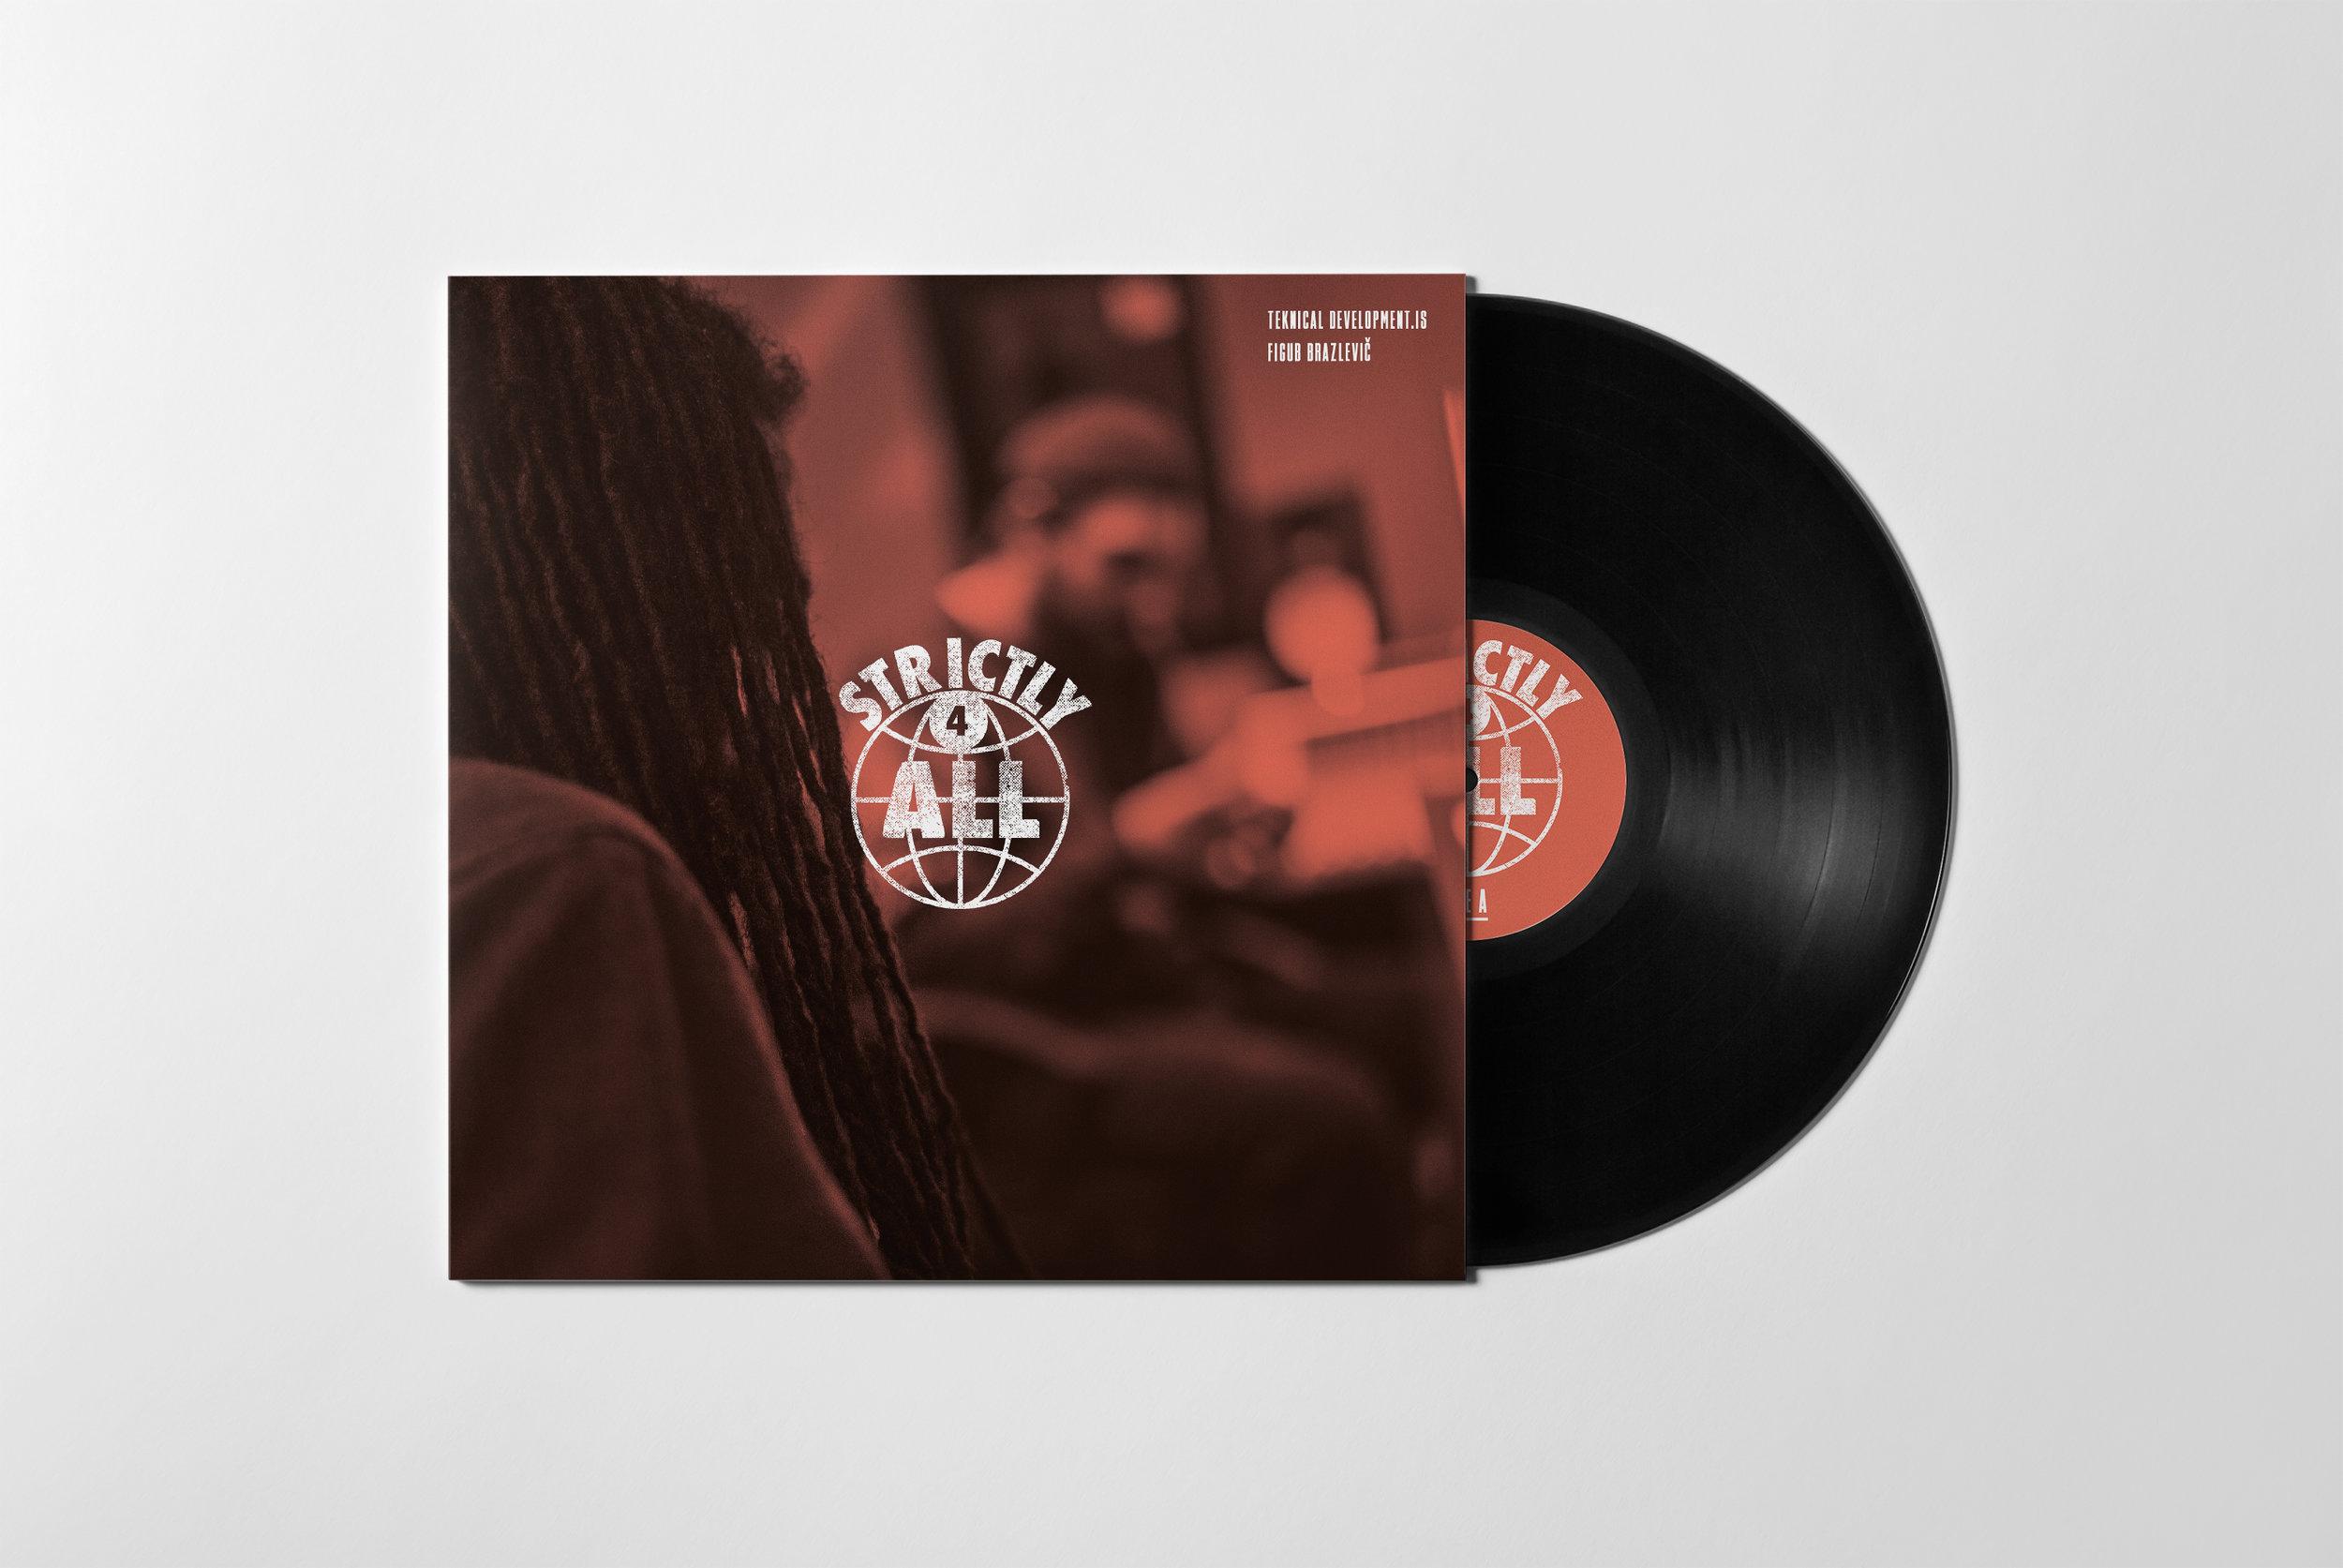 05_Vinyl Mock-up_box & vinyl_top view_s4a.jpg